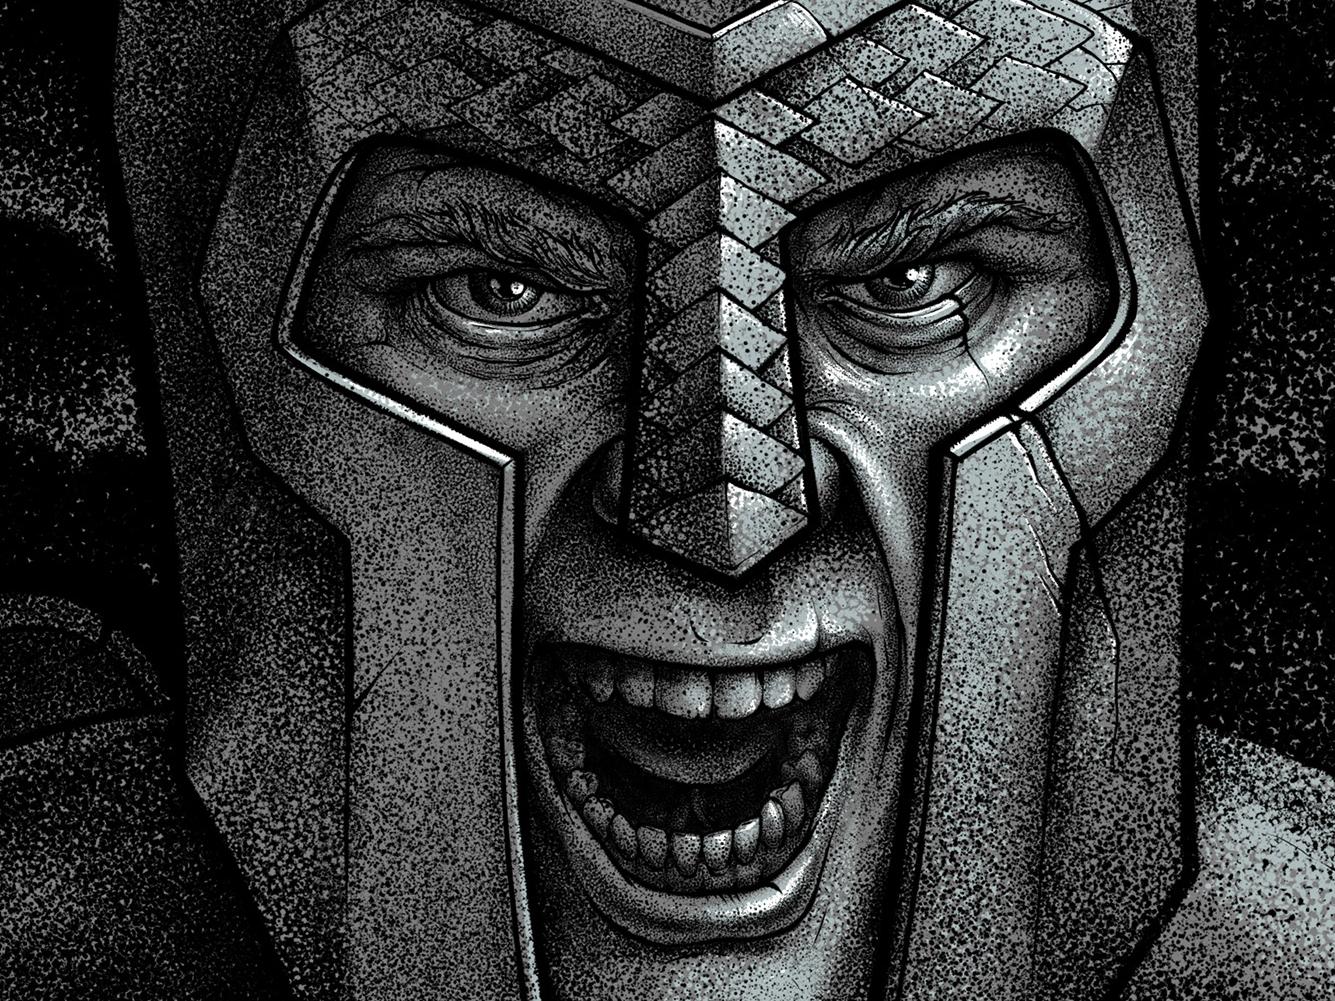 Spartak warriors spartak sparta illustration oleggert